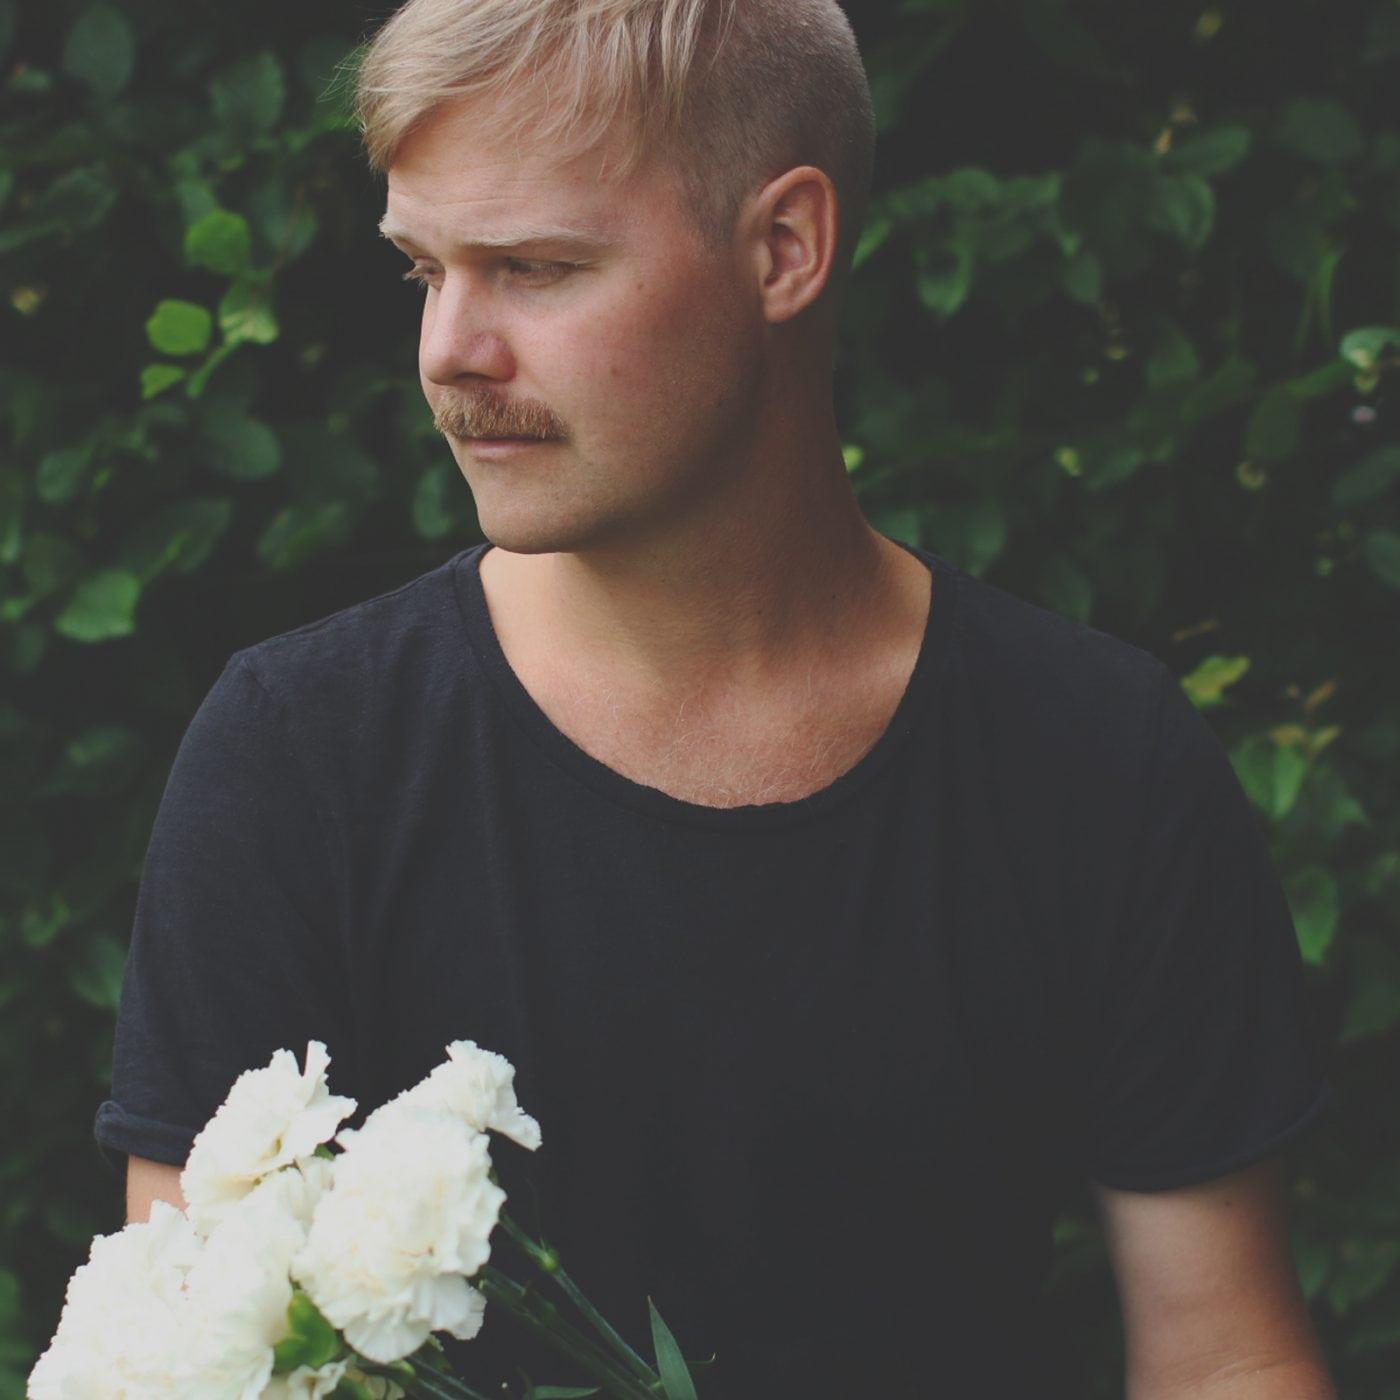 Erik Lindestad p3